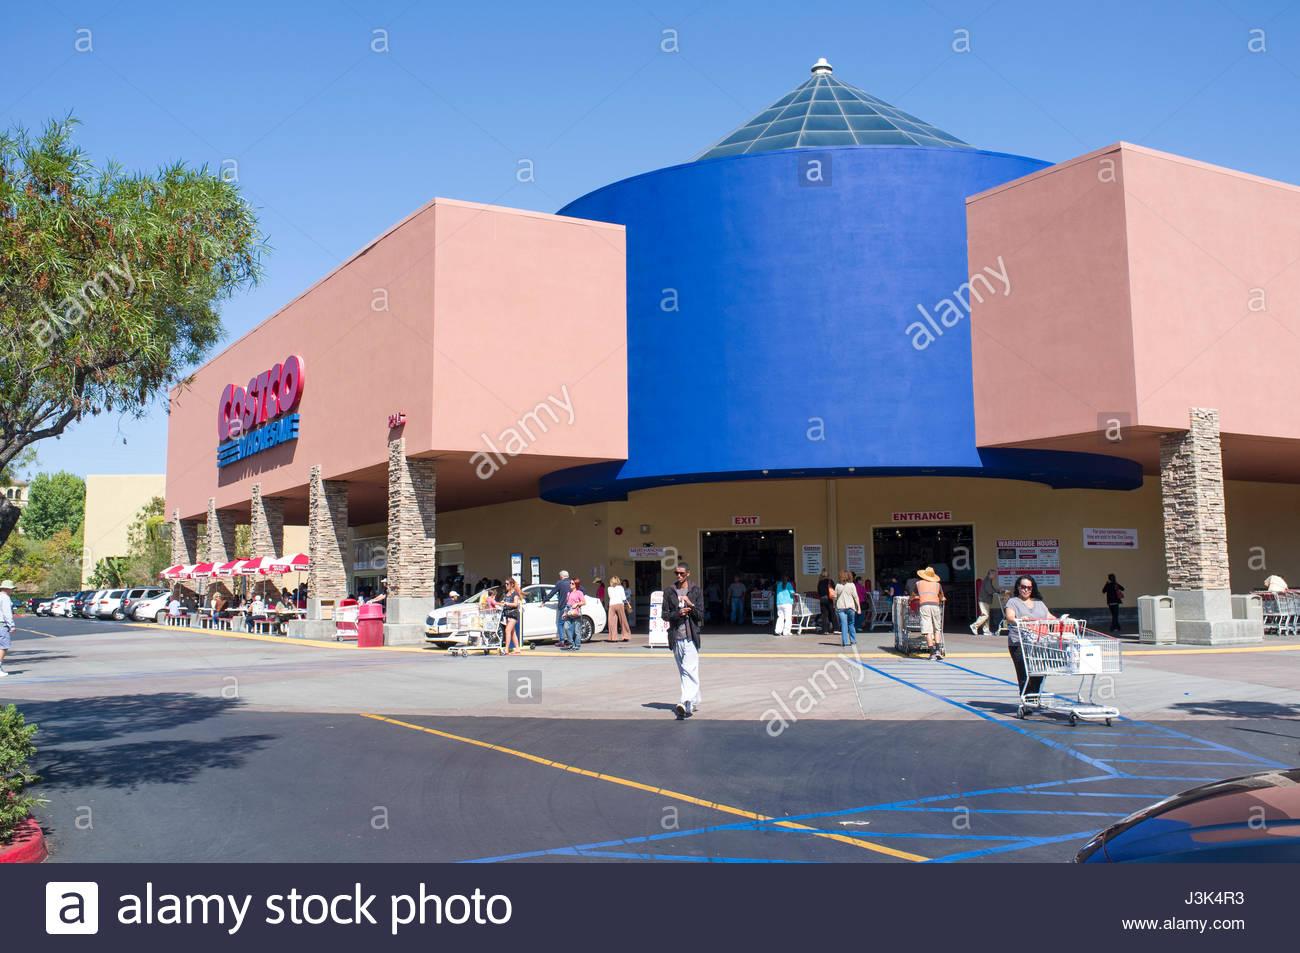 Costco Superstore, 2345 Fenton Pkwy, San Diego, California, USA